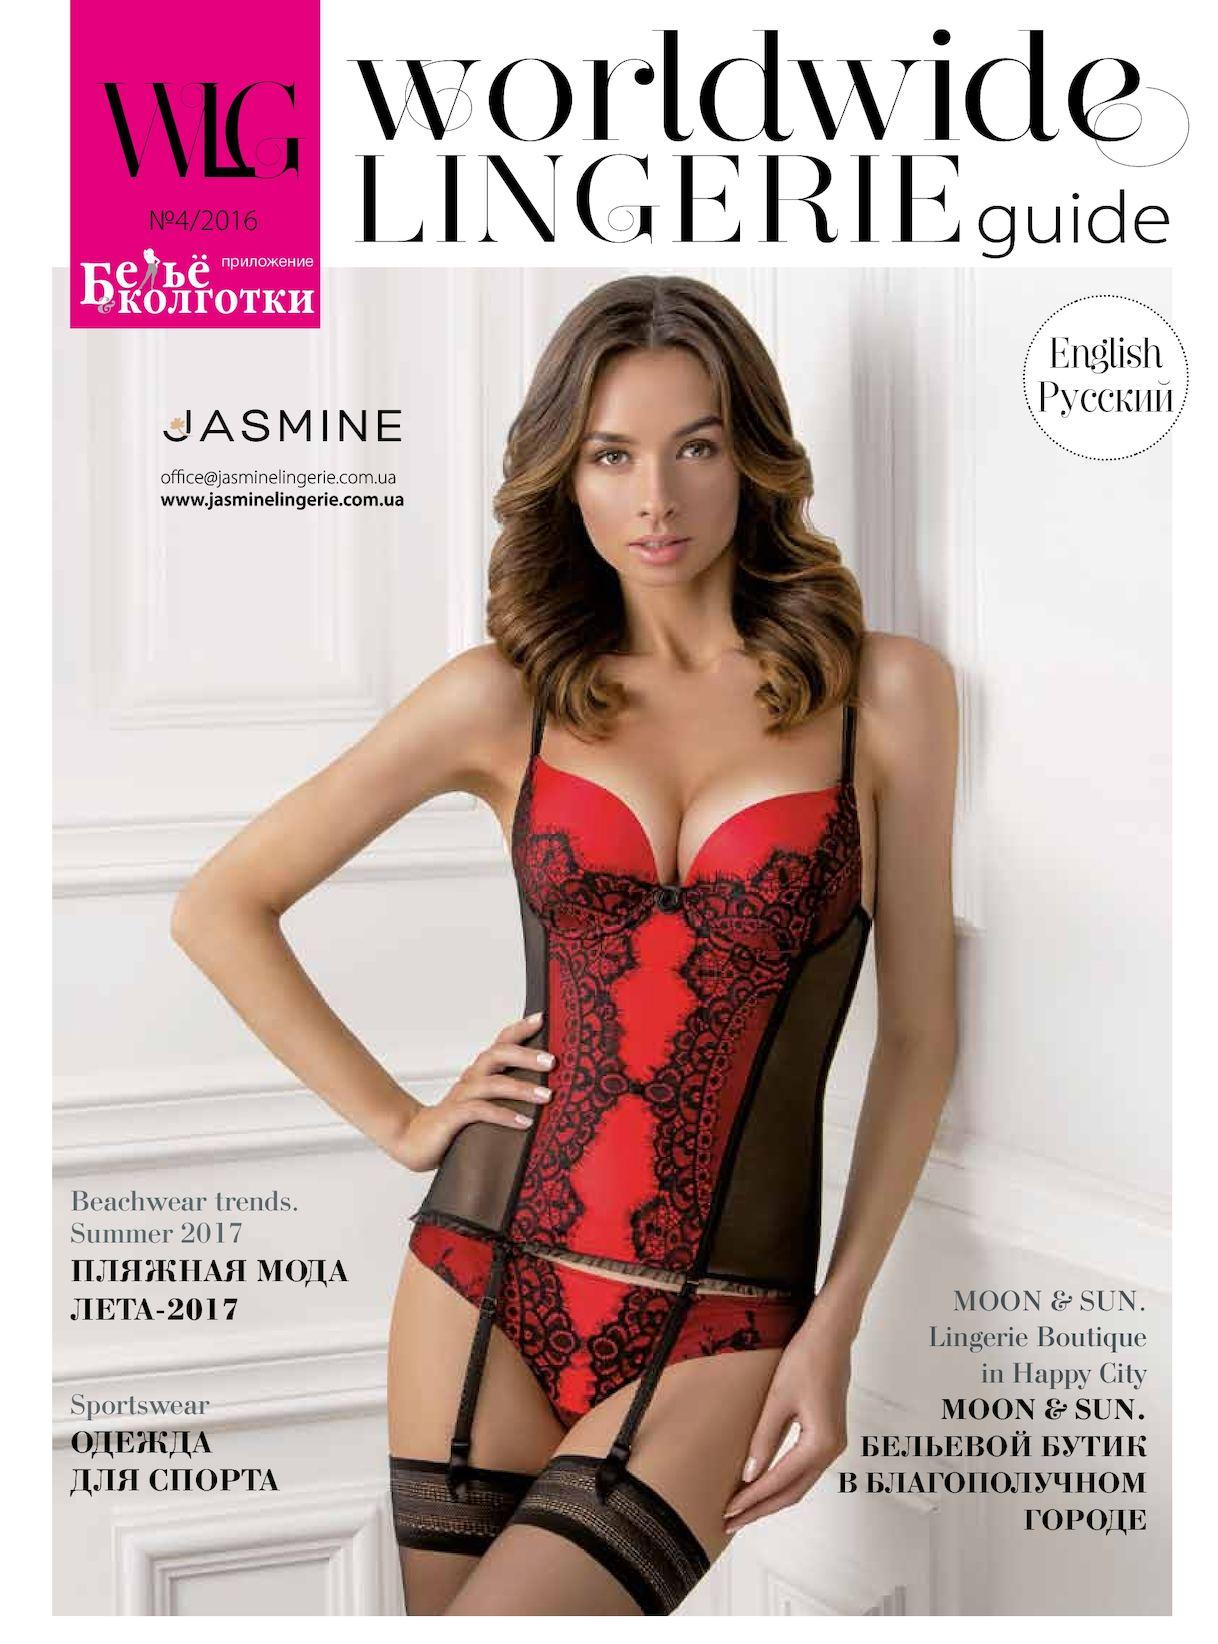 Calaméo - Worldwide Lingerie Guide 4 53528bcb0d252